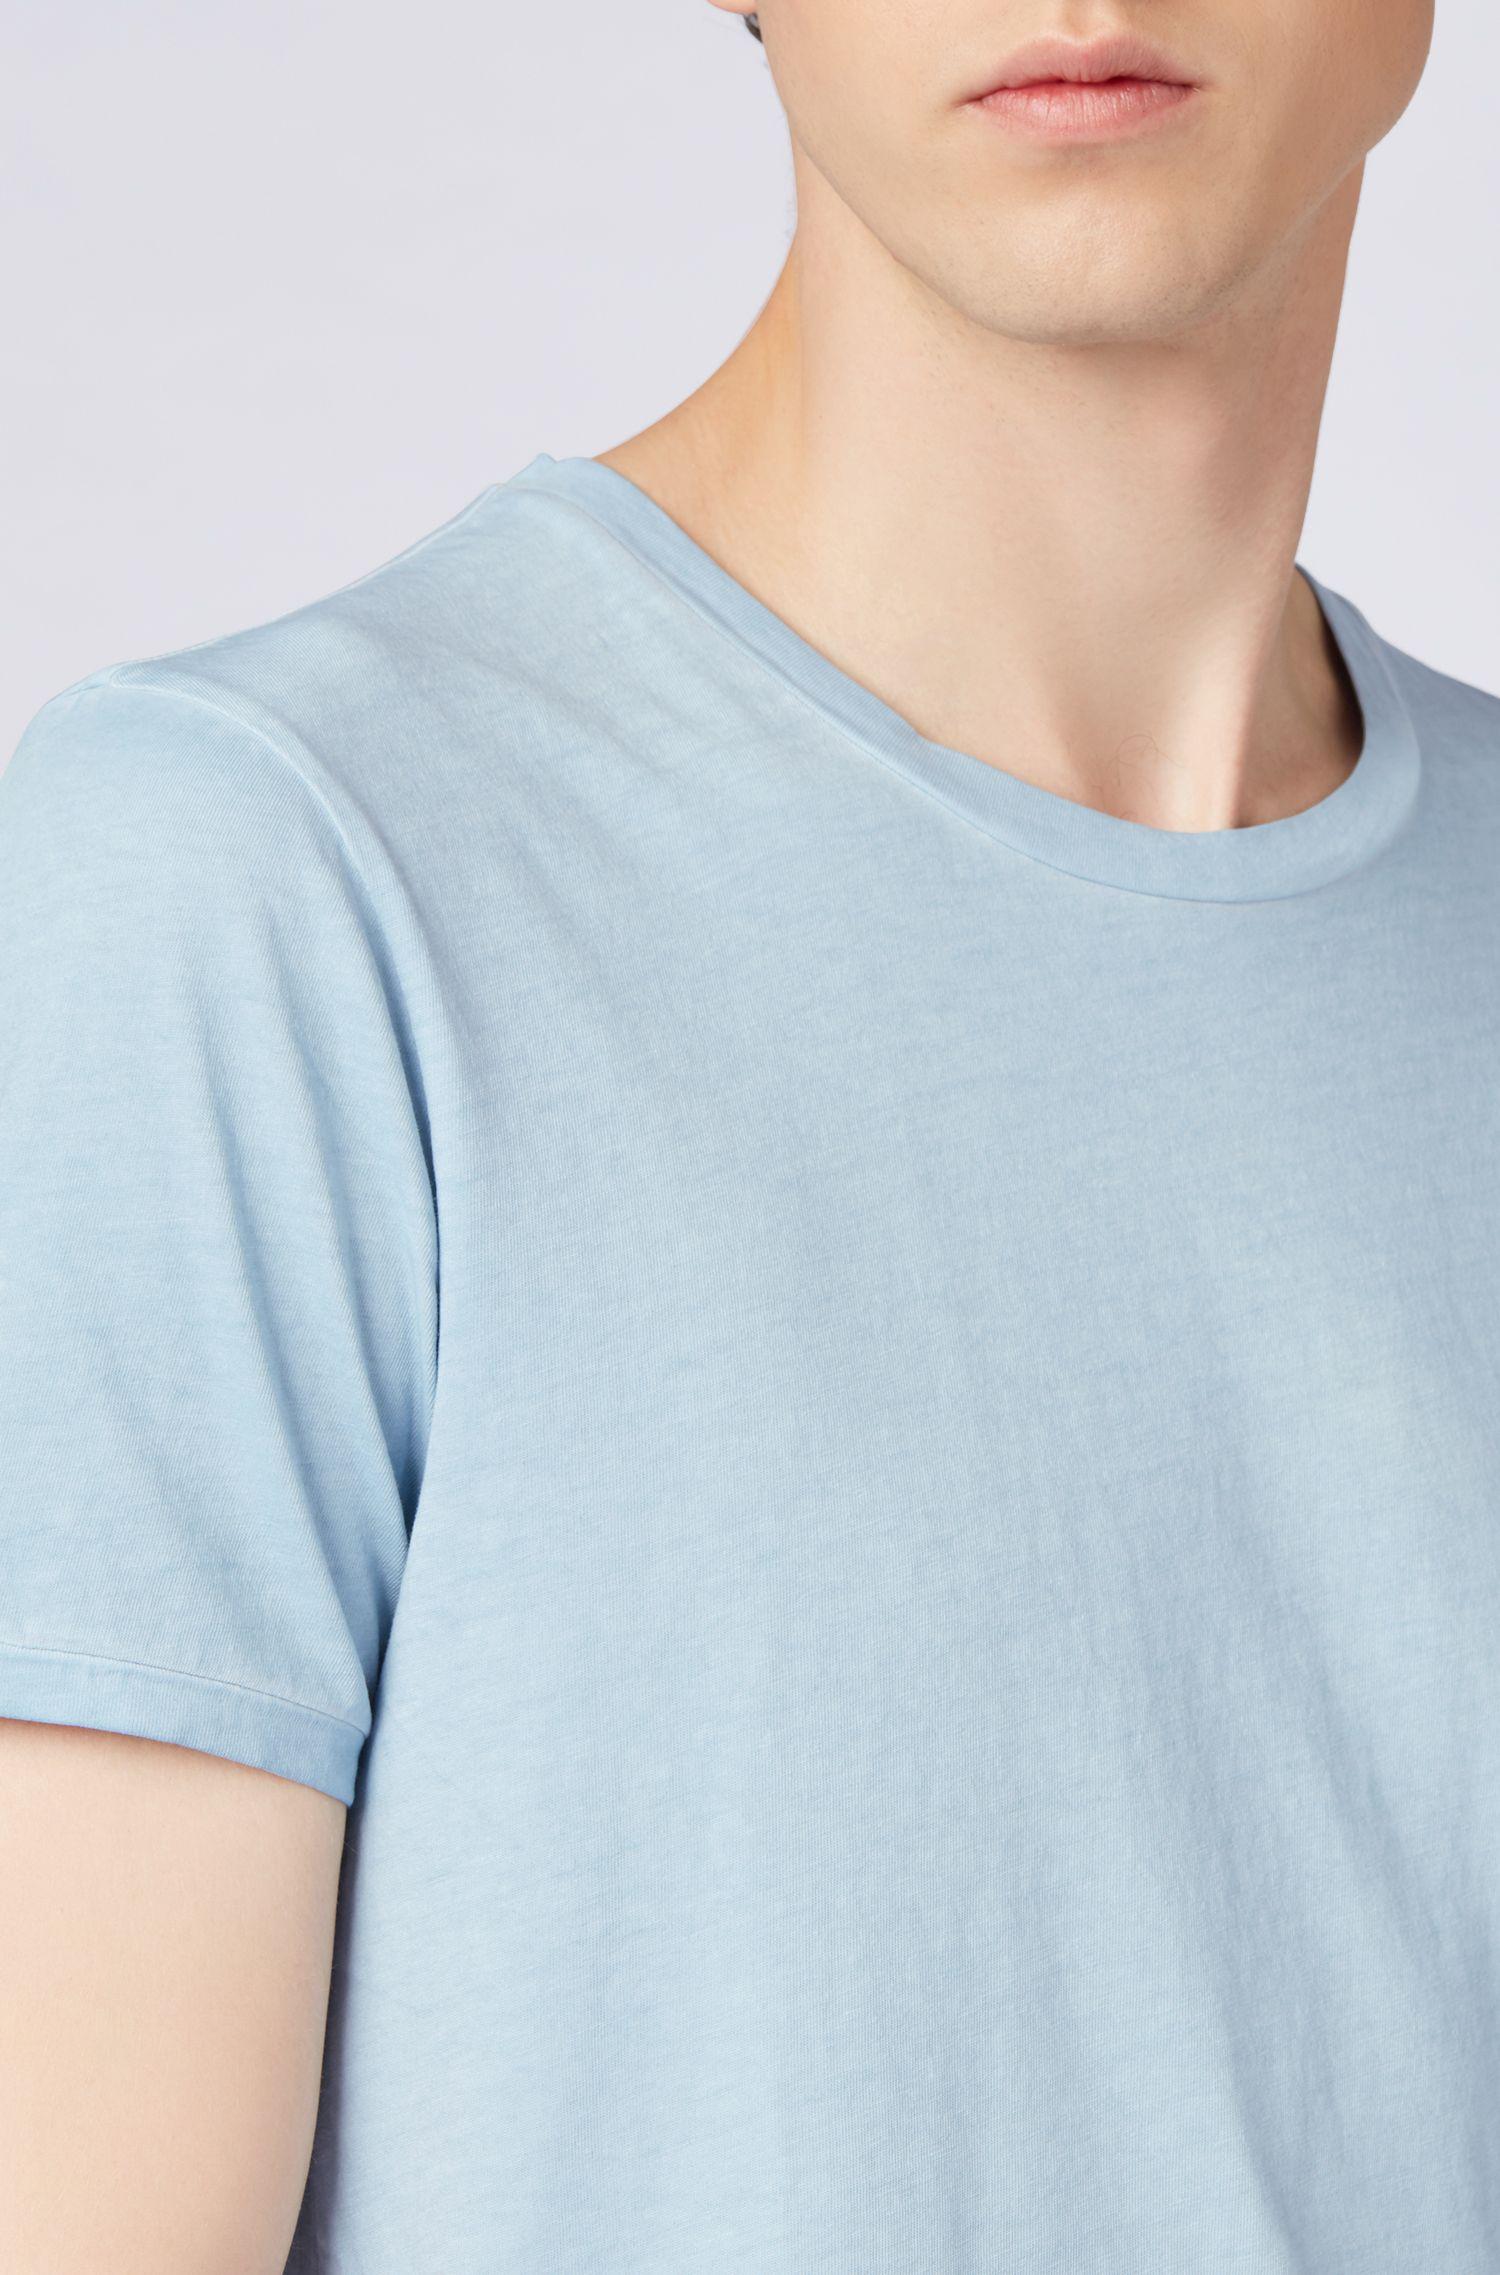 Stückgefärbtes Regular-Fit T-Shirt aus Baumwolle, Hellblau